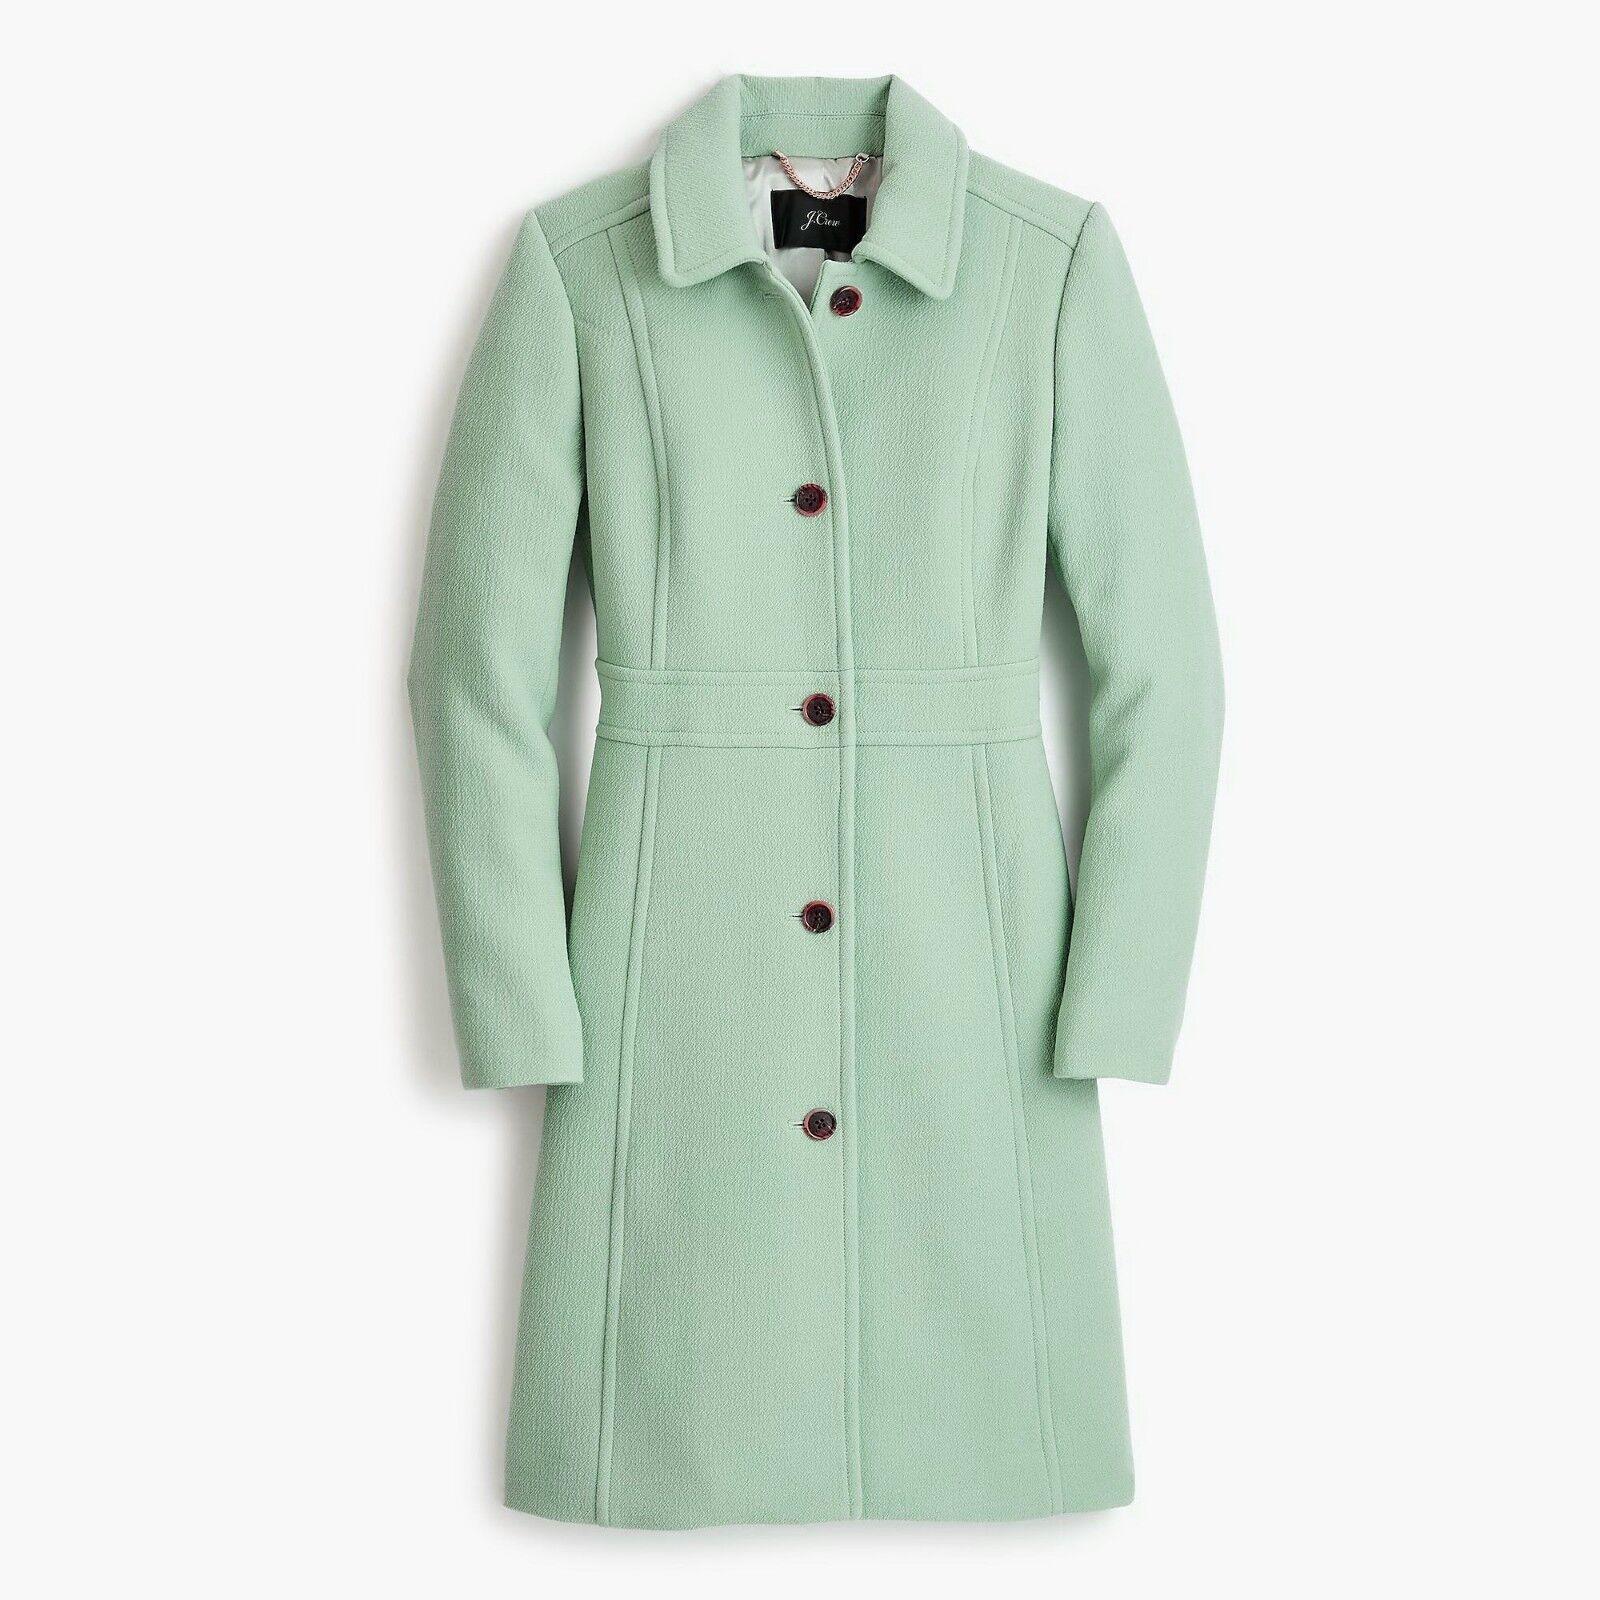 NWT Jbesättnings italienska Wool Lady Day Coat, Qukonstz grå, petite 2 - 378